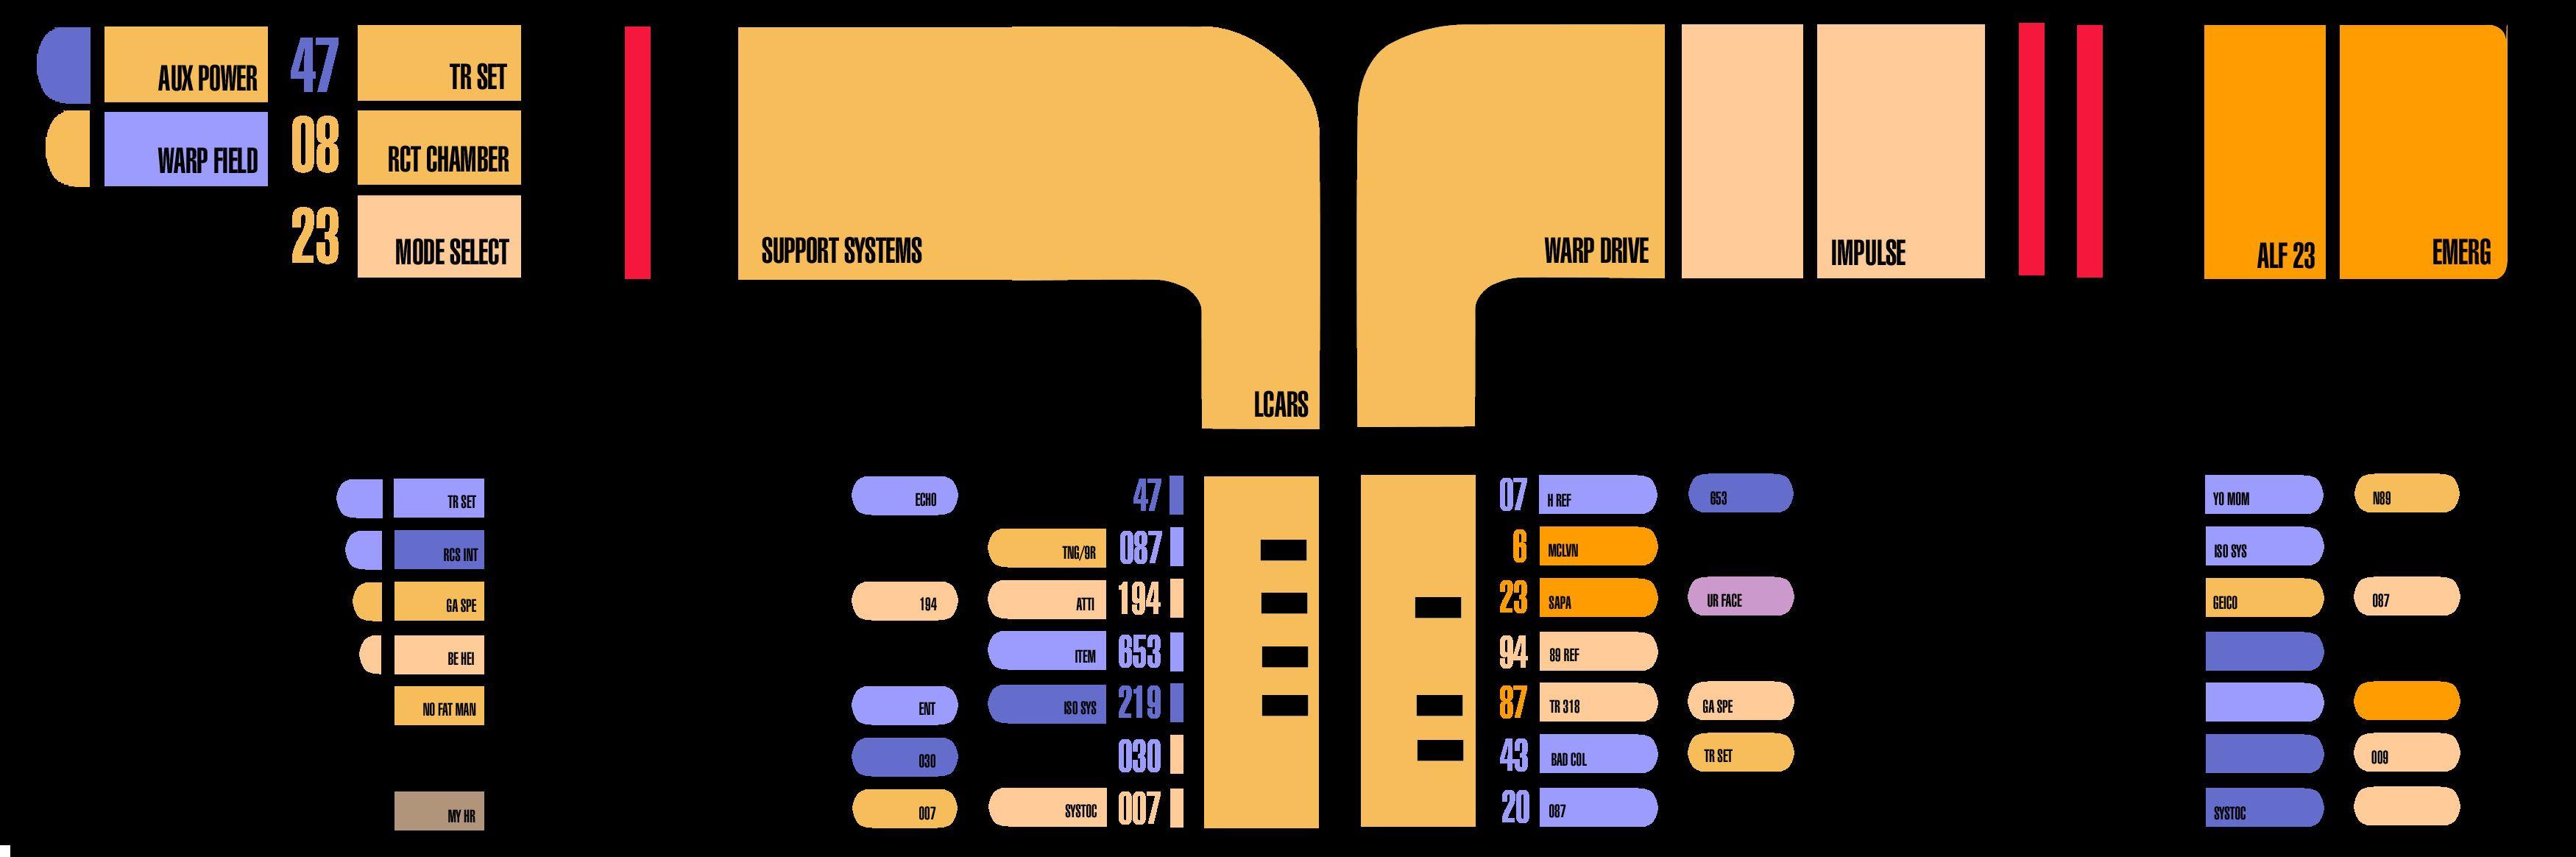 Starship control panel